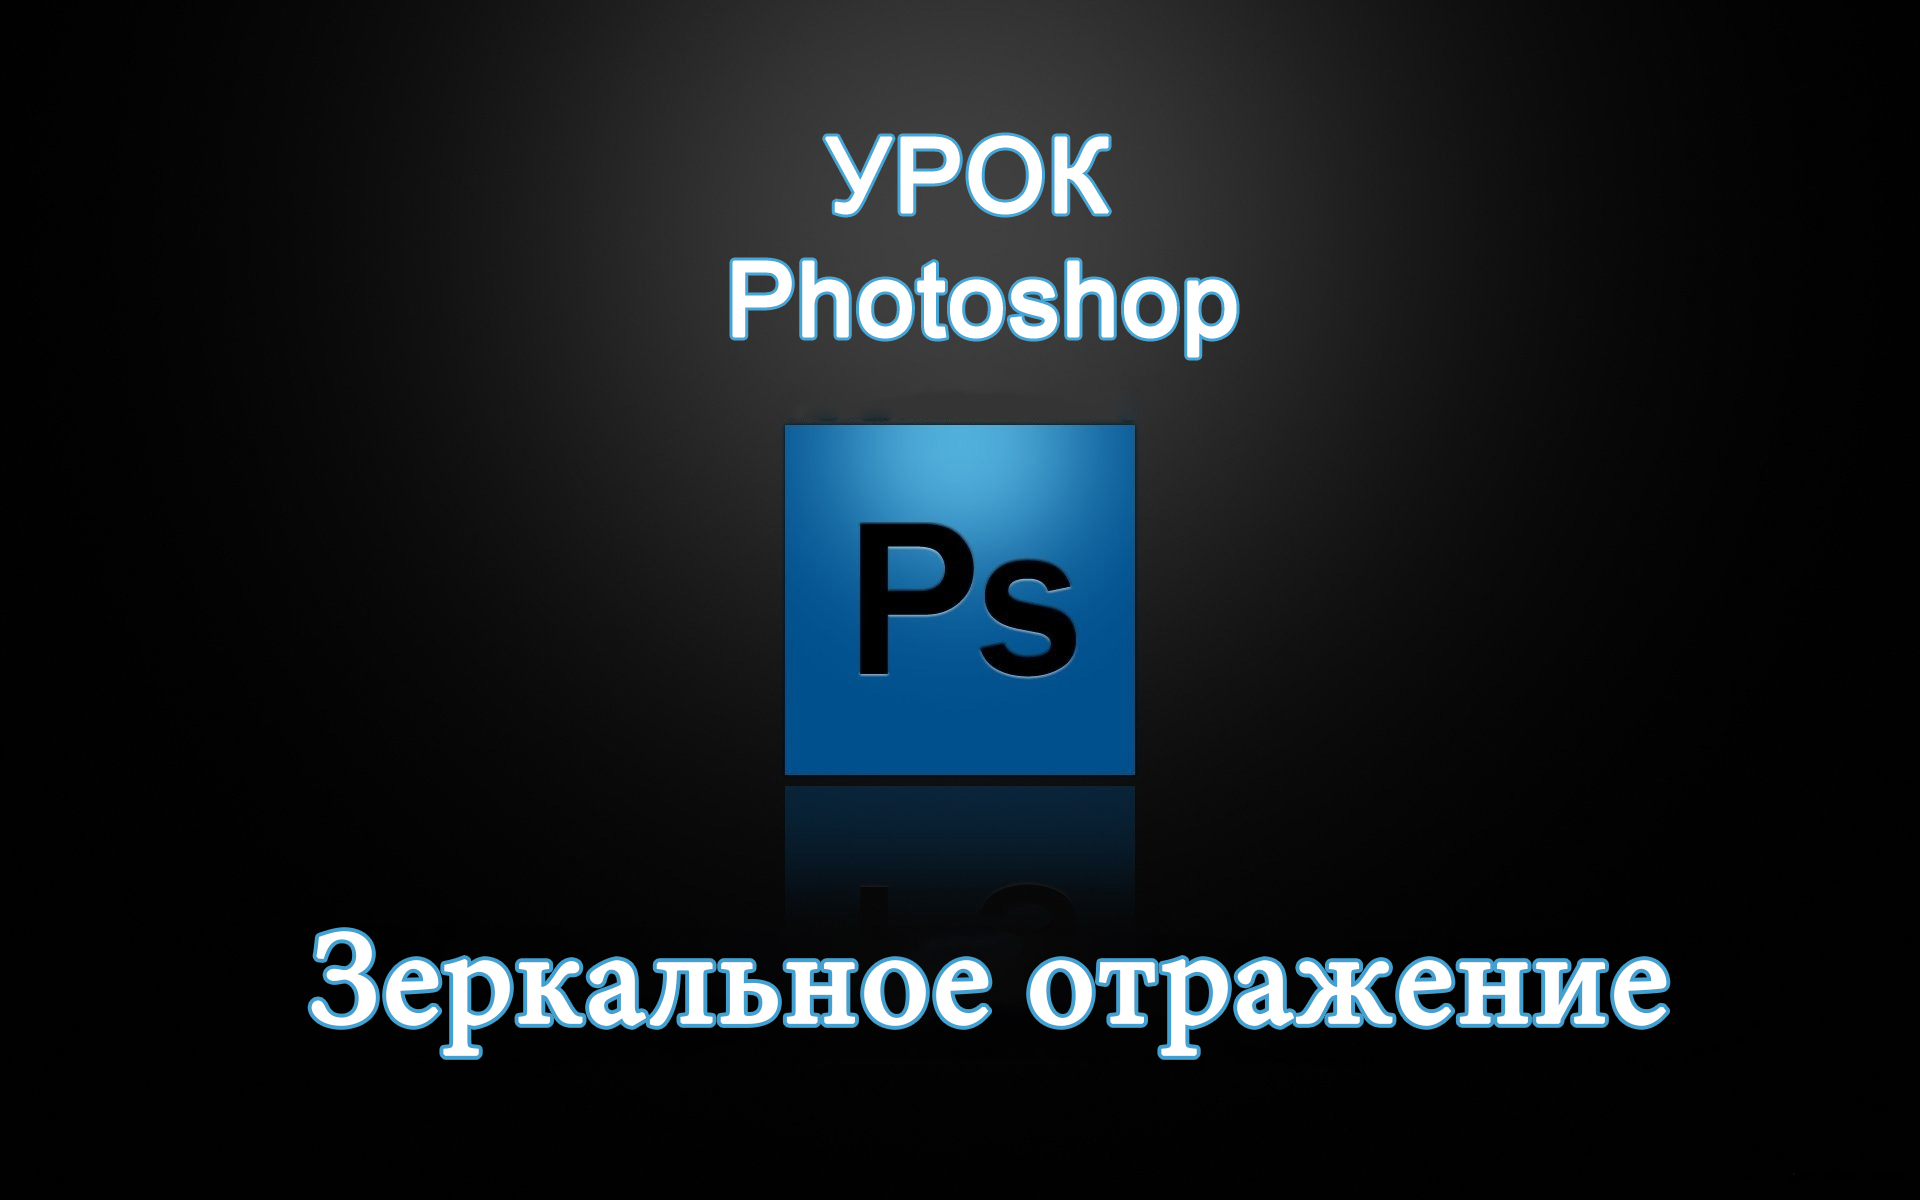 Как сделать зеркальное отражение в фотошопе: http://vgtk.ru/homework/191-zerkalnoe-otrazhenie-v-fotoshope.html